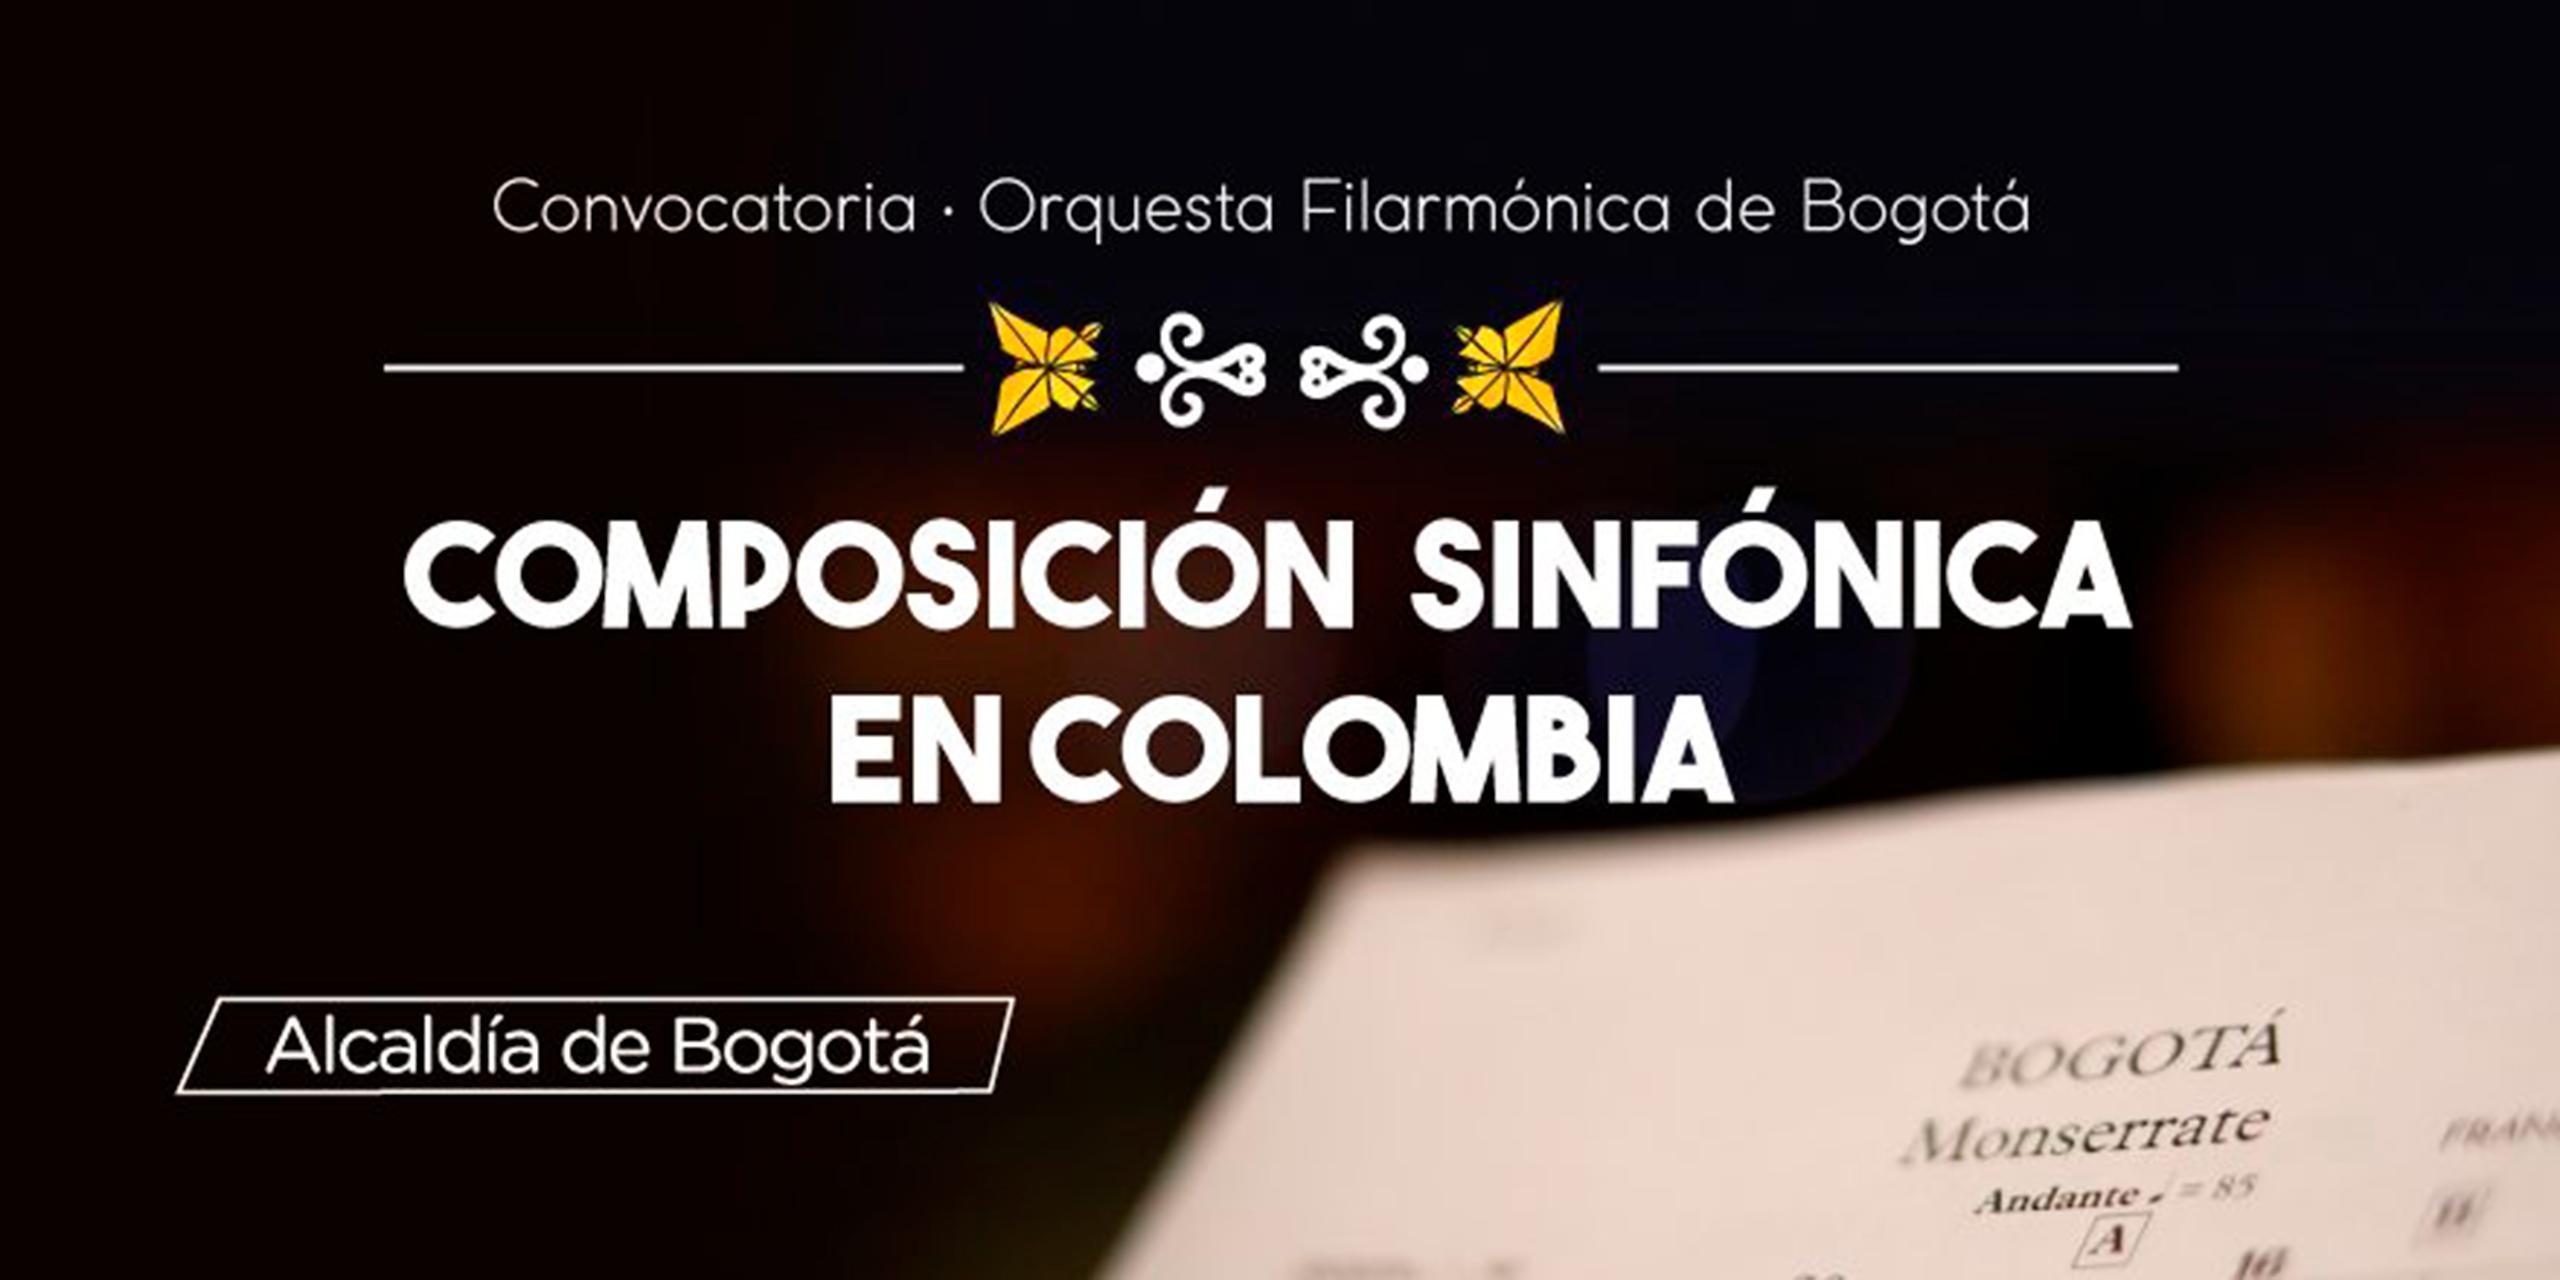 Convocatoria: Composición Sinfónica en Colombia – Catálogo Digital